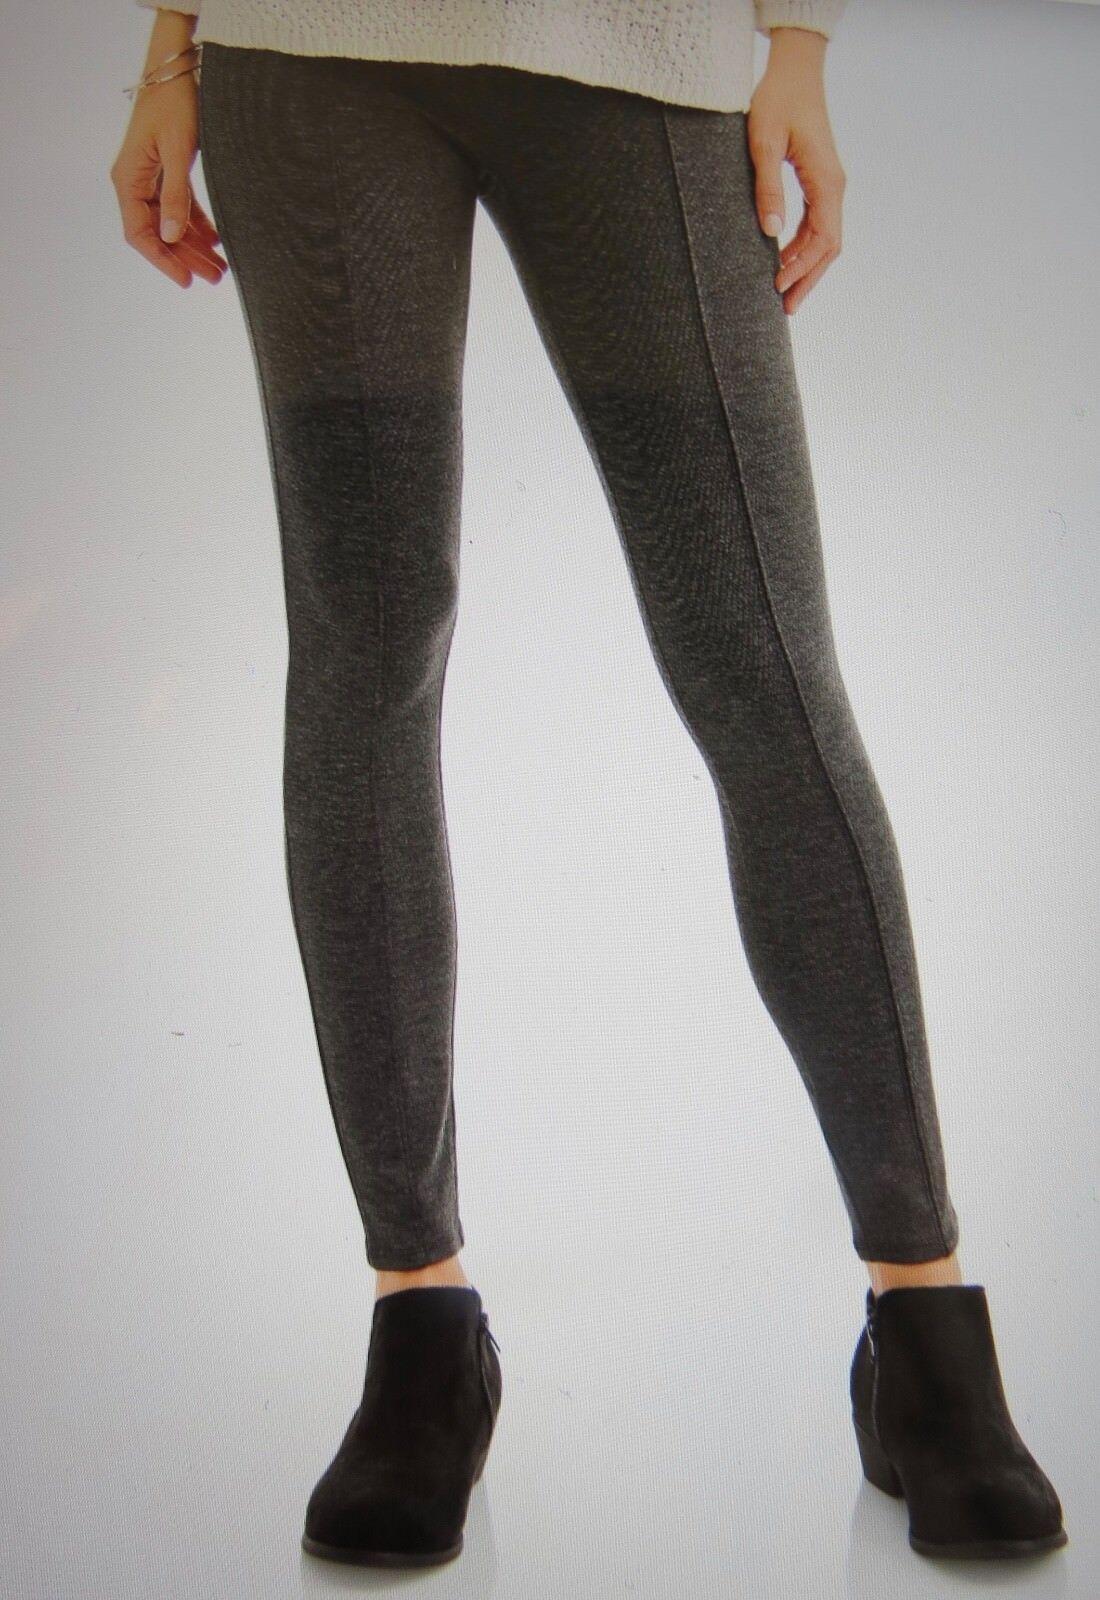 186973b2280f2 Womens XS 0-2 Ponte Leggings Gray Faded Glory Soft Stretch Fabric ...